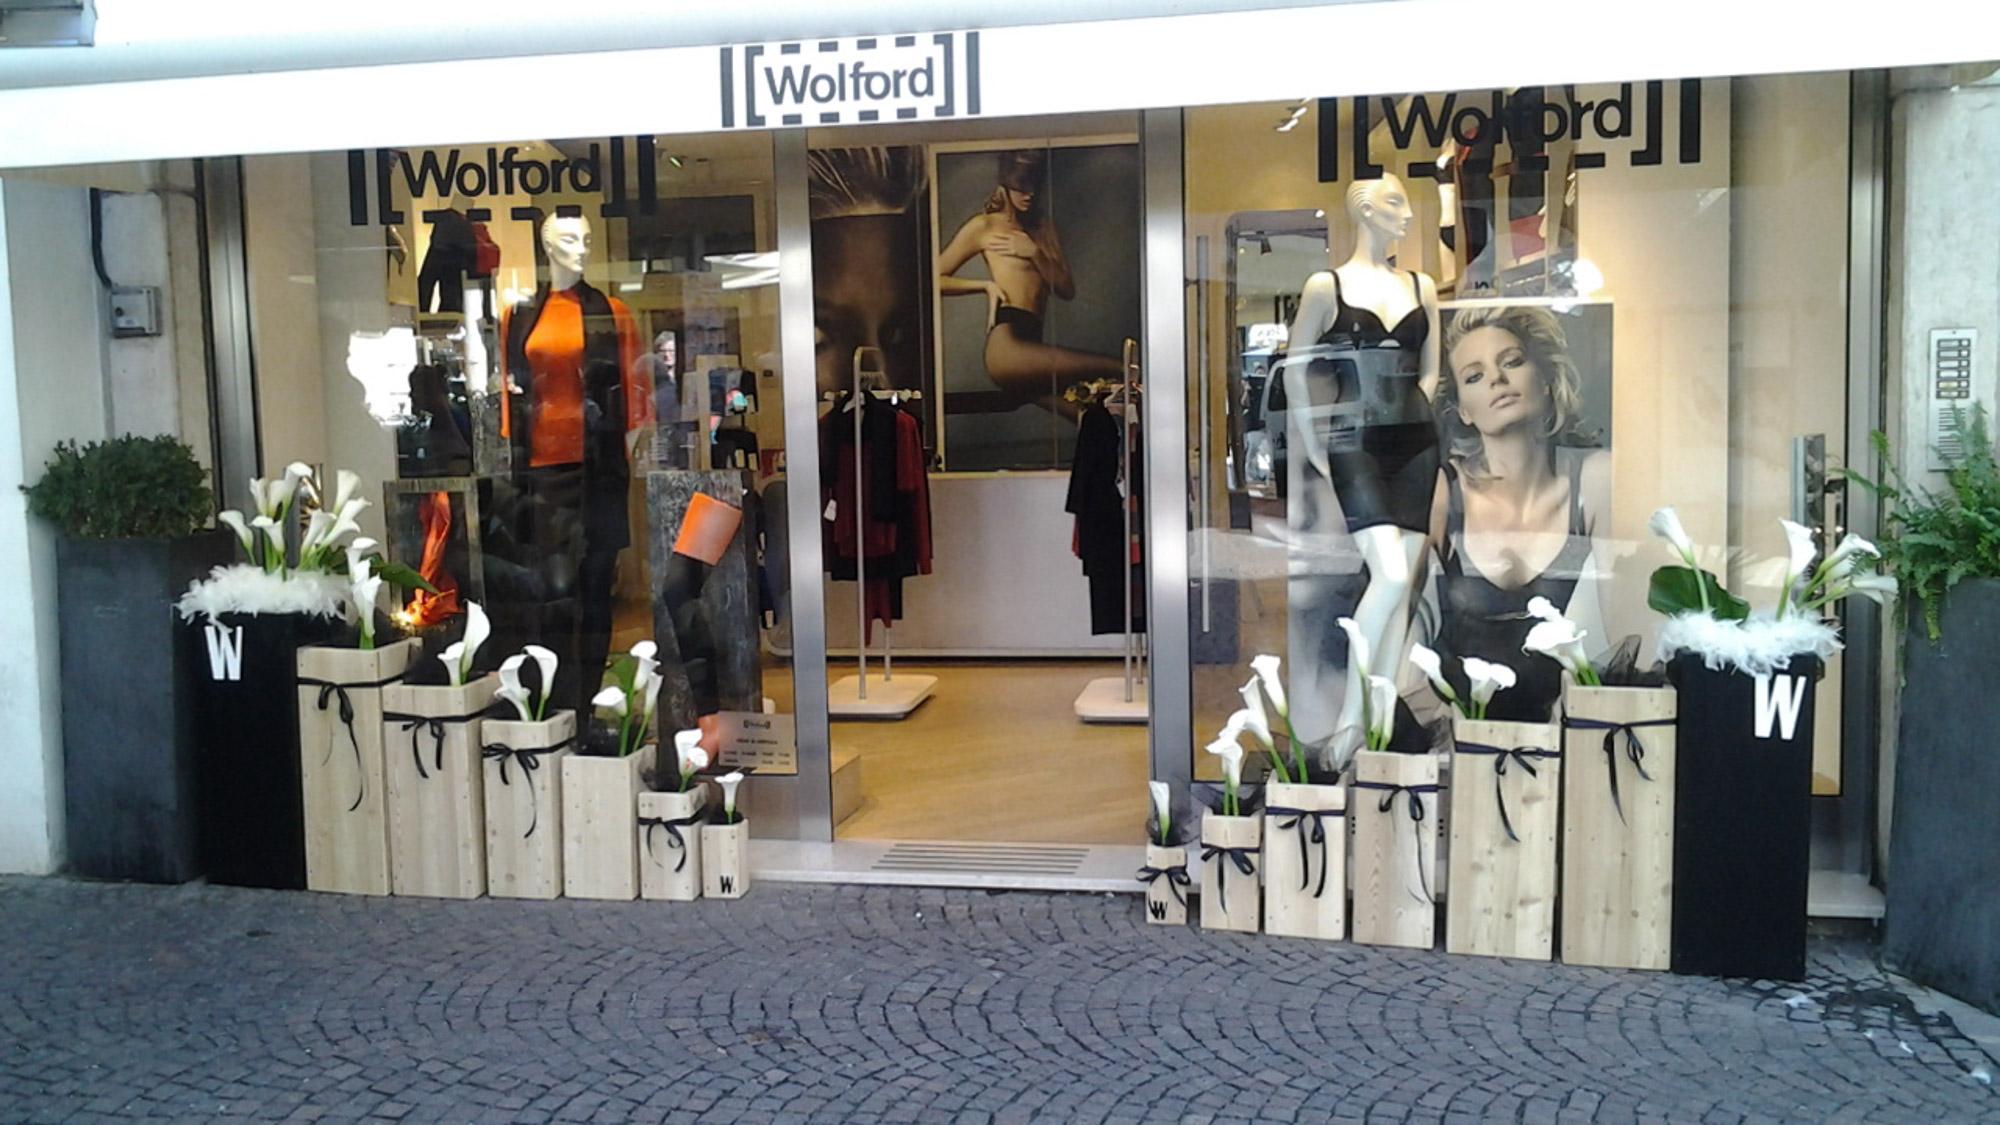 allestimenti-bolzano-wolford